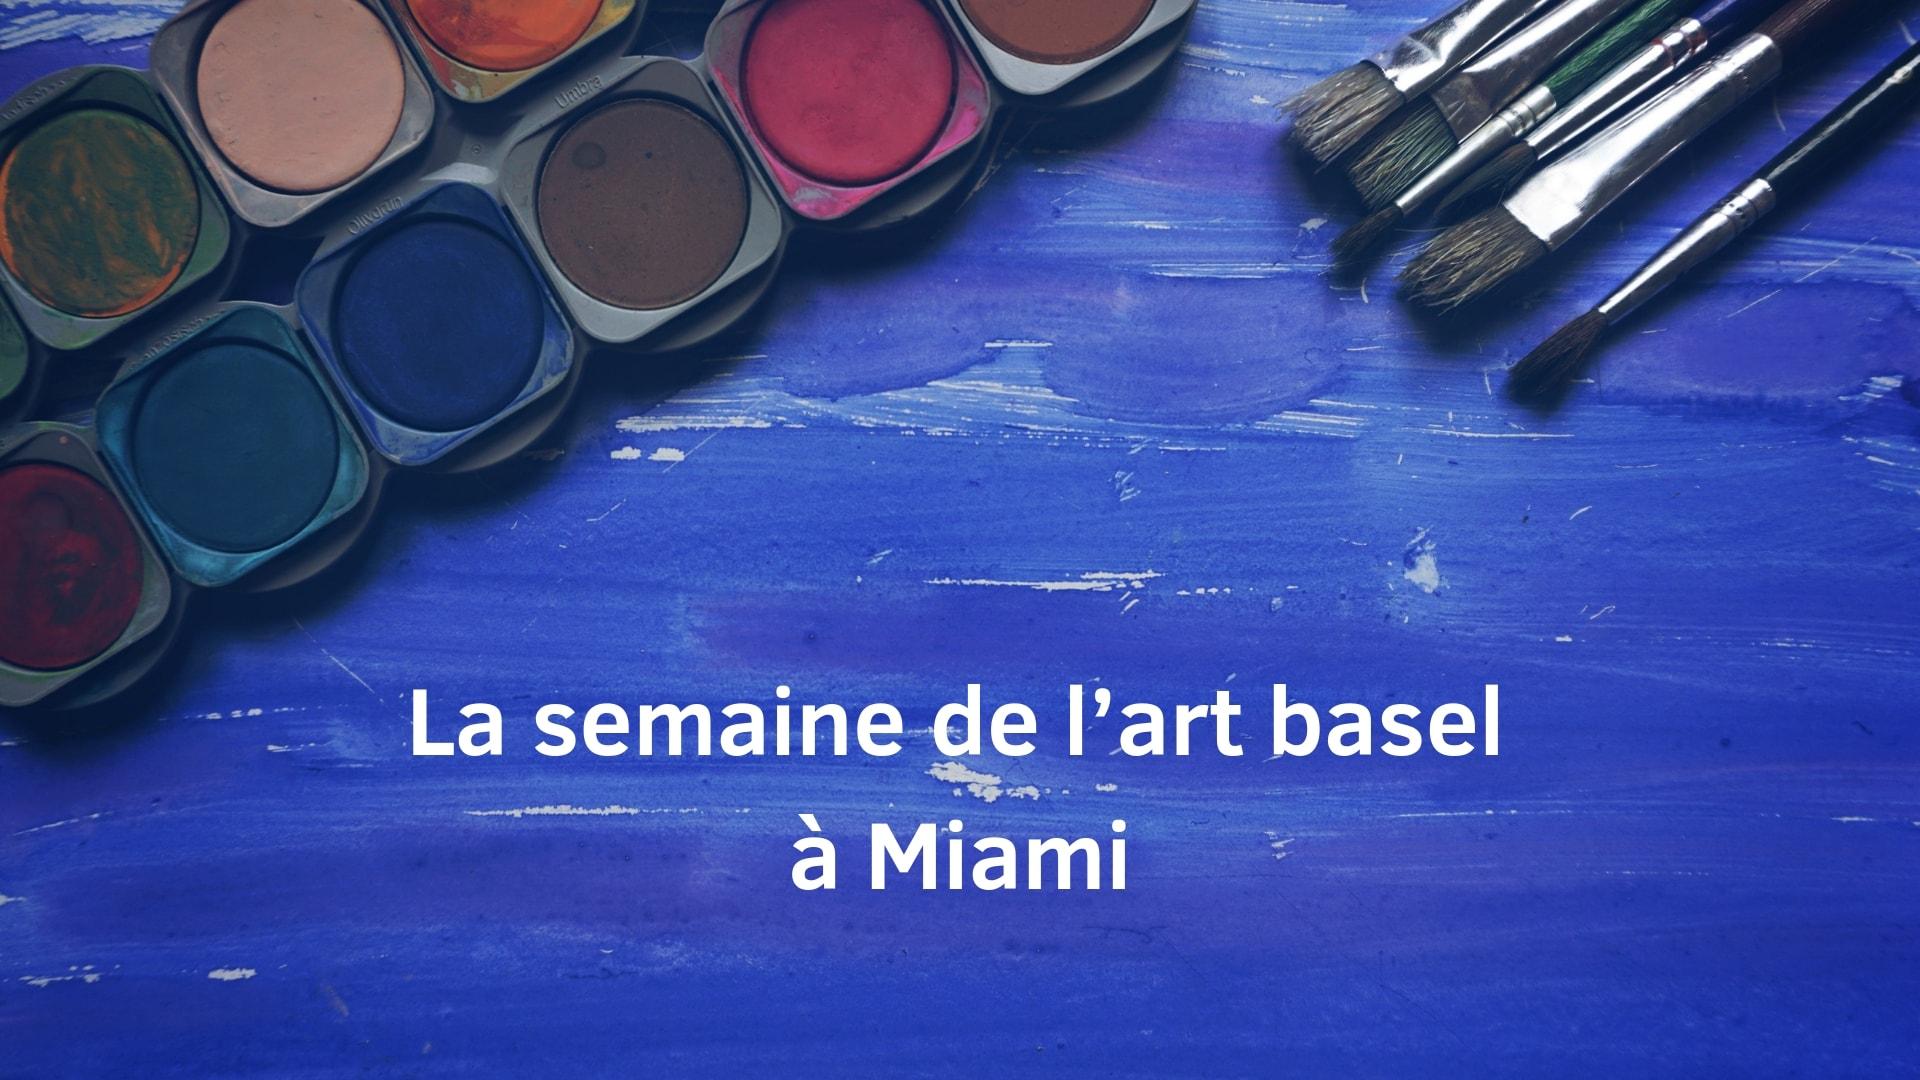 La semaine de l'art basel à Miami